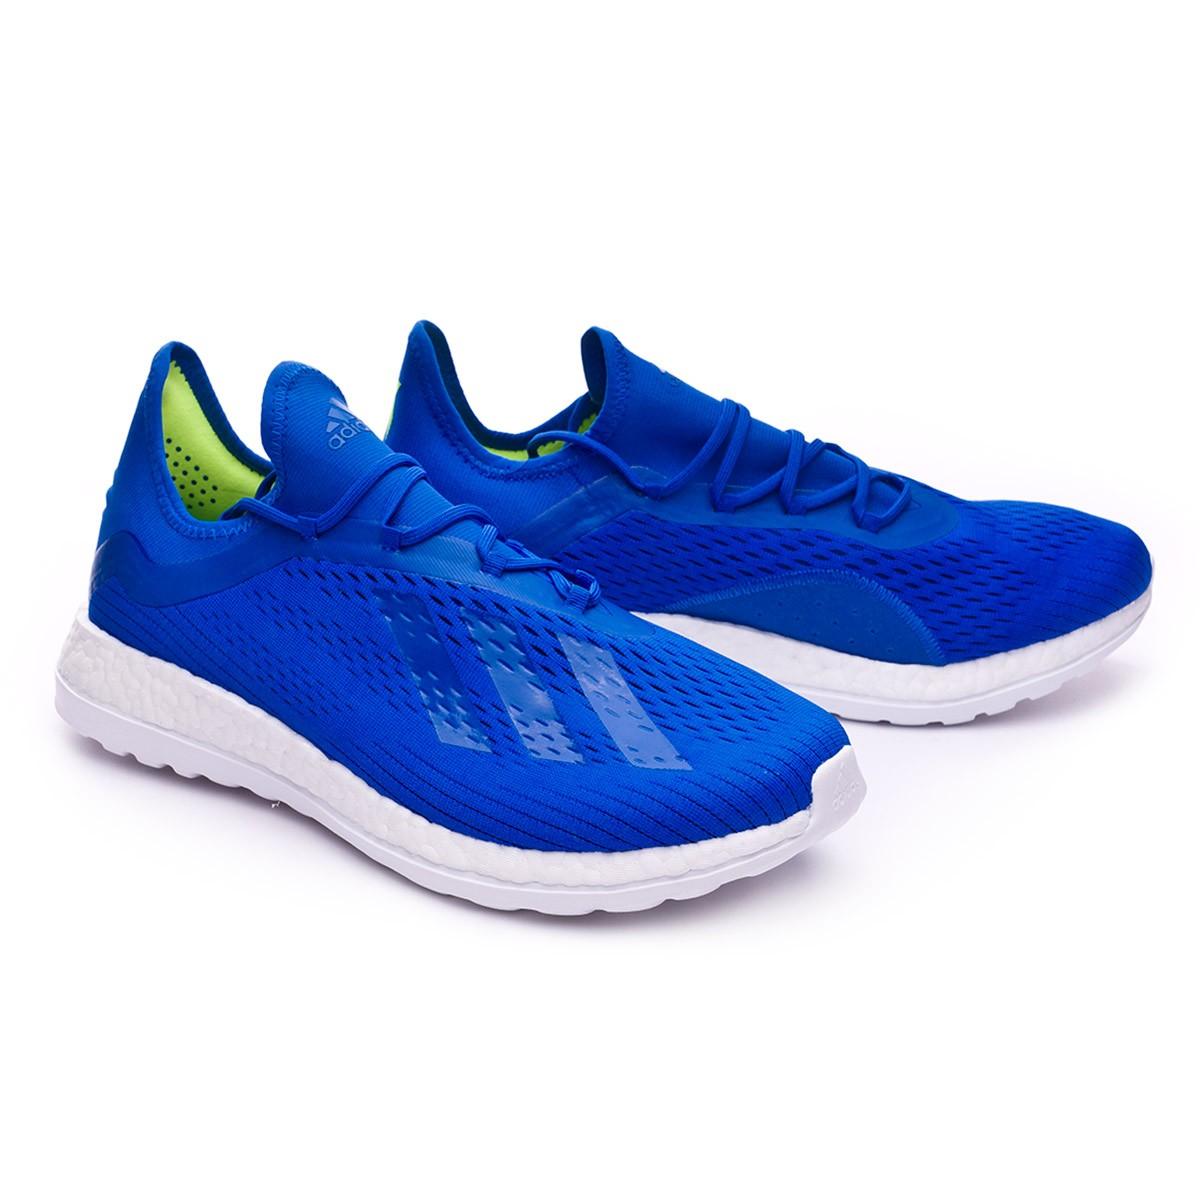 Scarpa Urban adidas X18 Adizero TR Ice blueGold metallic